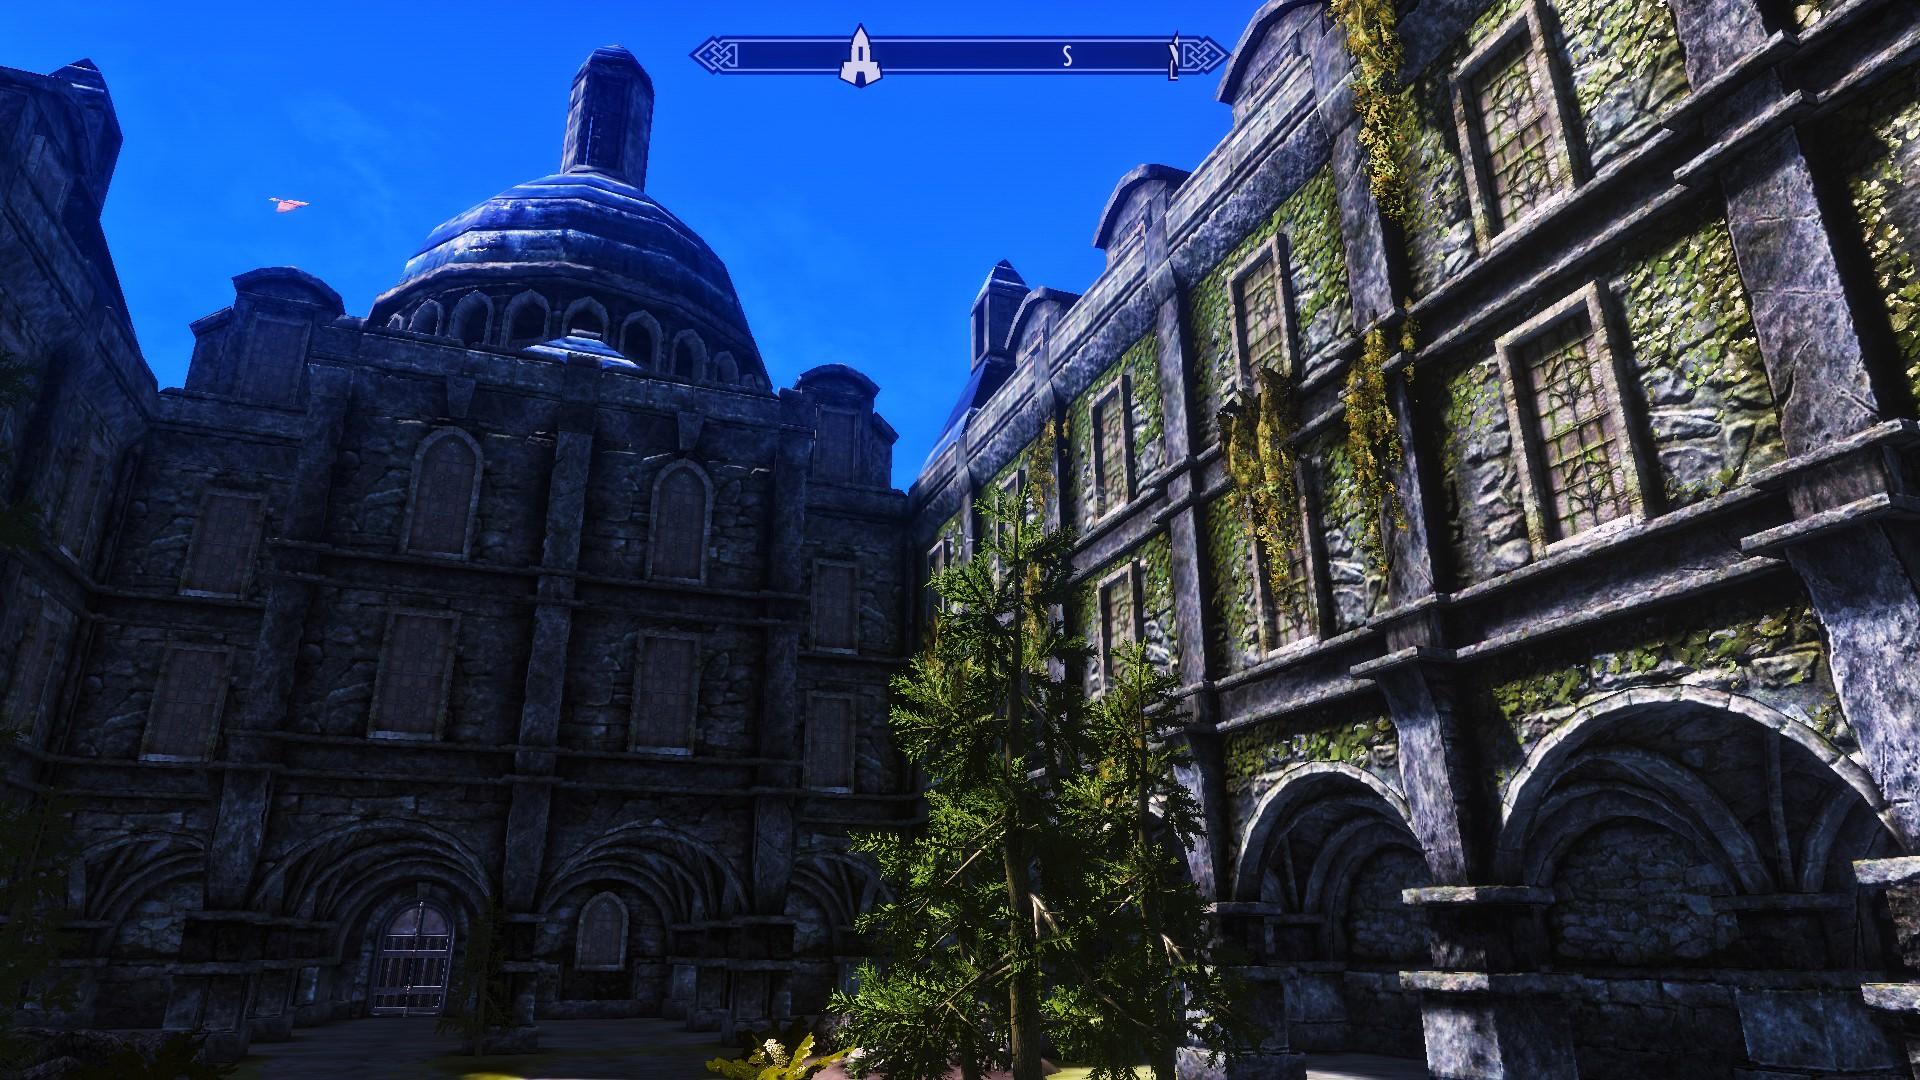 20180311220314_1.jpg - Elder Scrolls 5: Skyrim, the